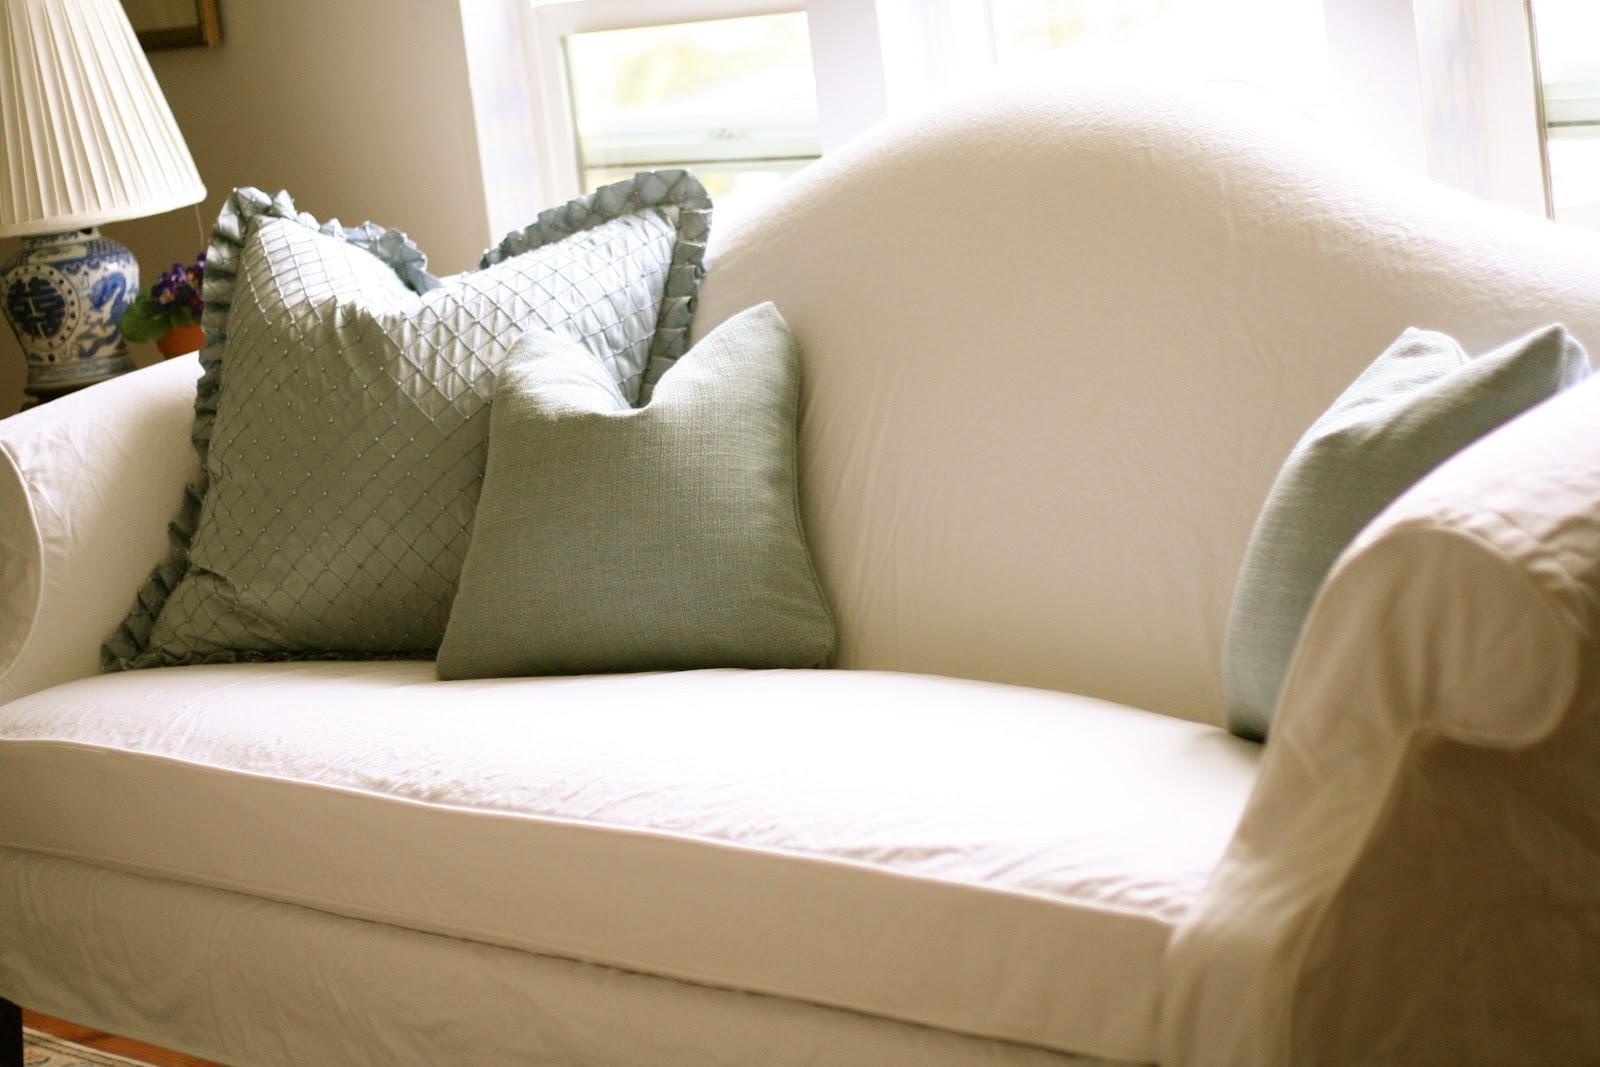 Slipcover For Camelback Sofa Sofa Cover For Camelback – Thesofa Regarding Camel Back Sofa Slipcovers (Image 17 of 20)